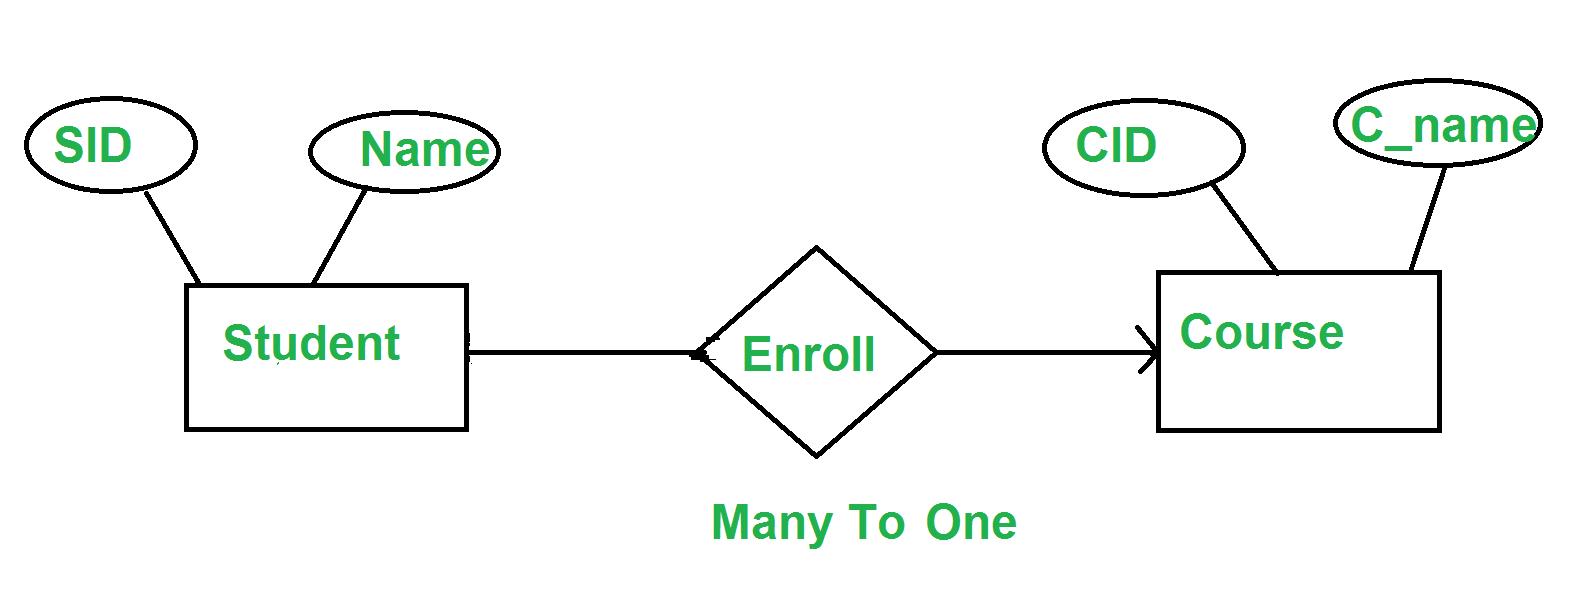 Minimization Of Er Diagrams - Geeksforgeeks pertaining to Er Diagram 1 To Many